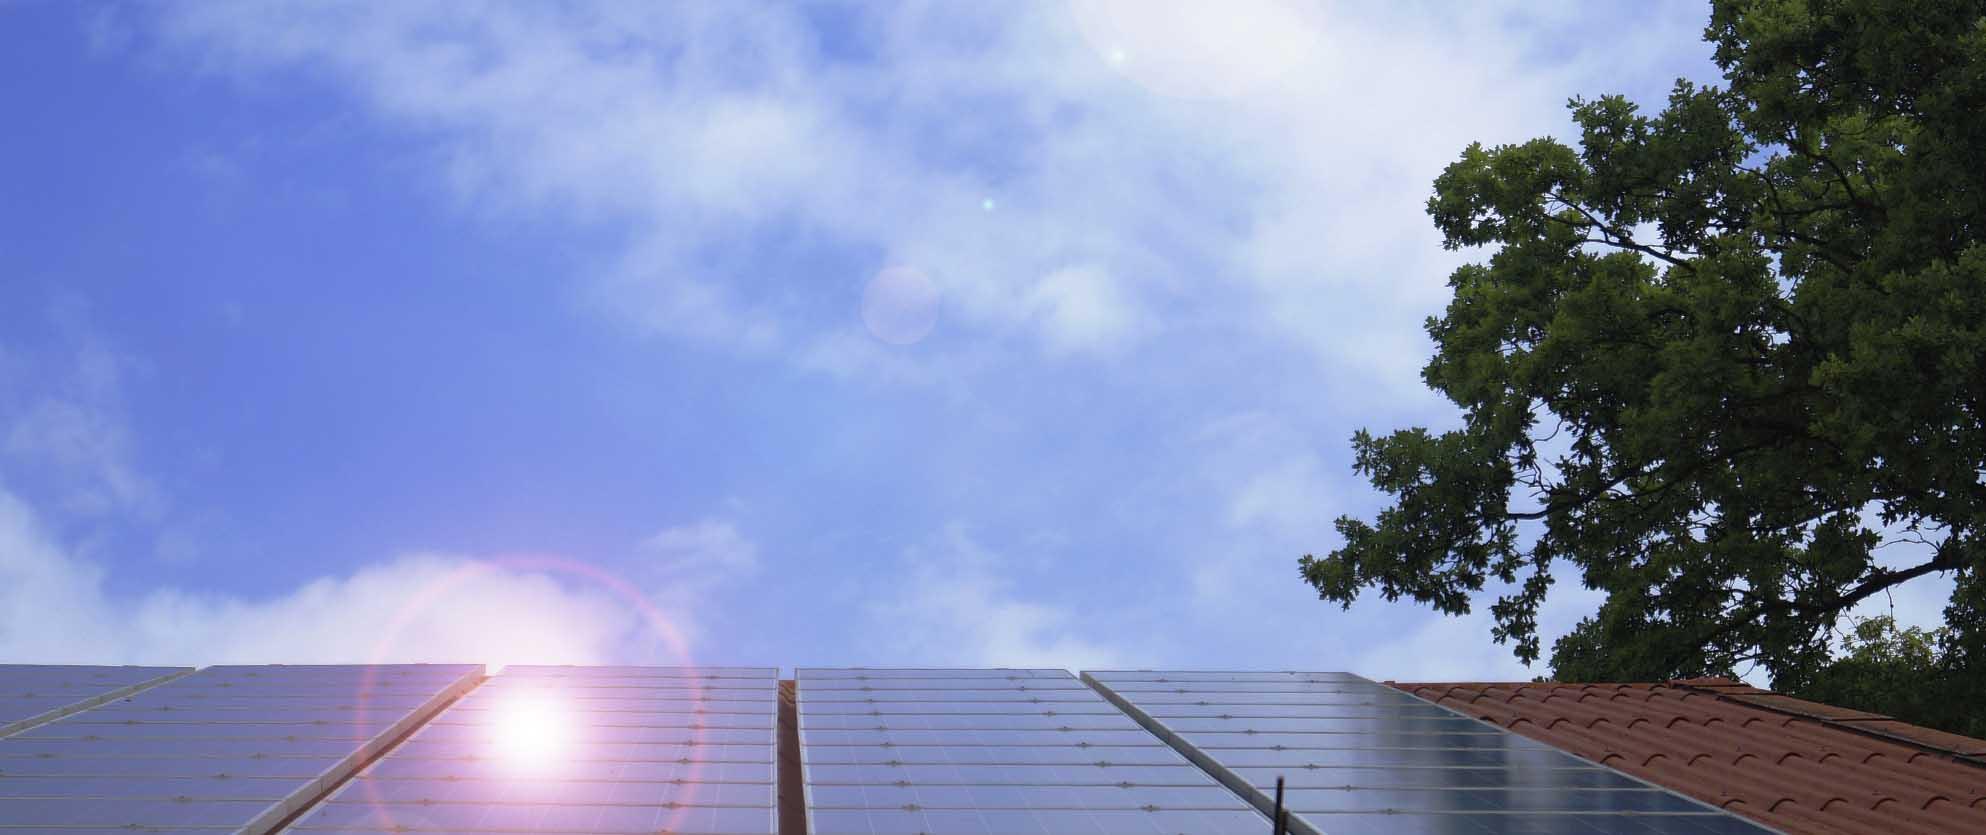 solarpanel-startseite-3